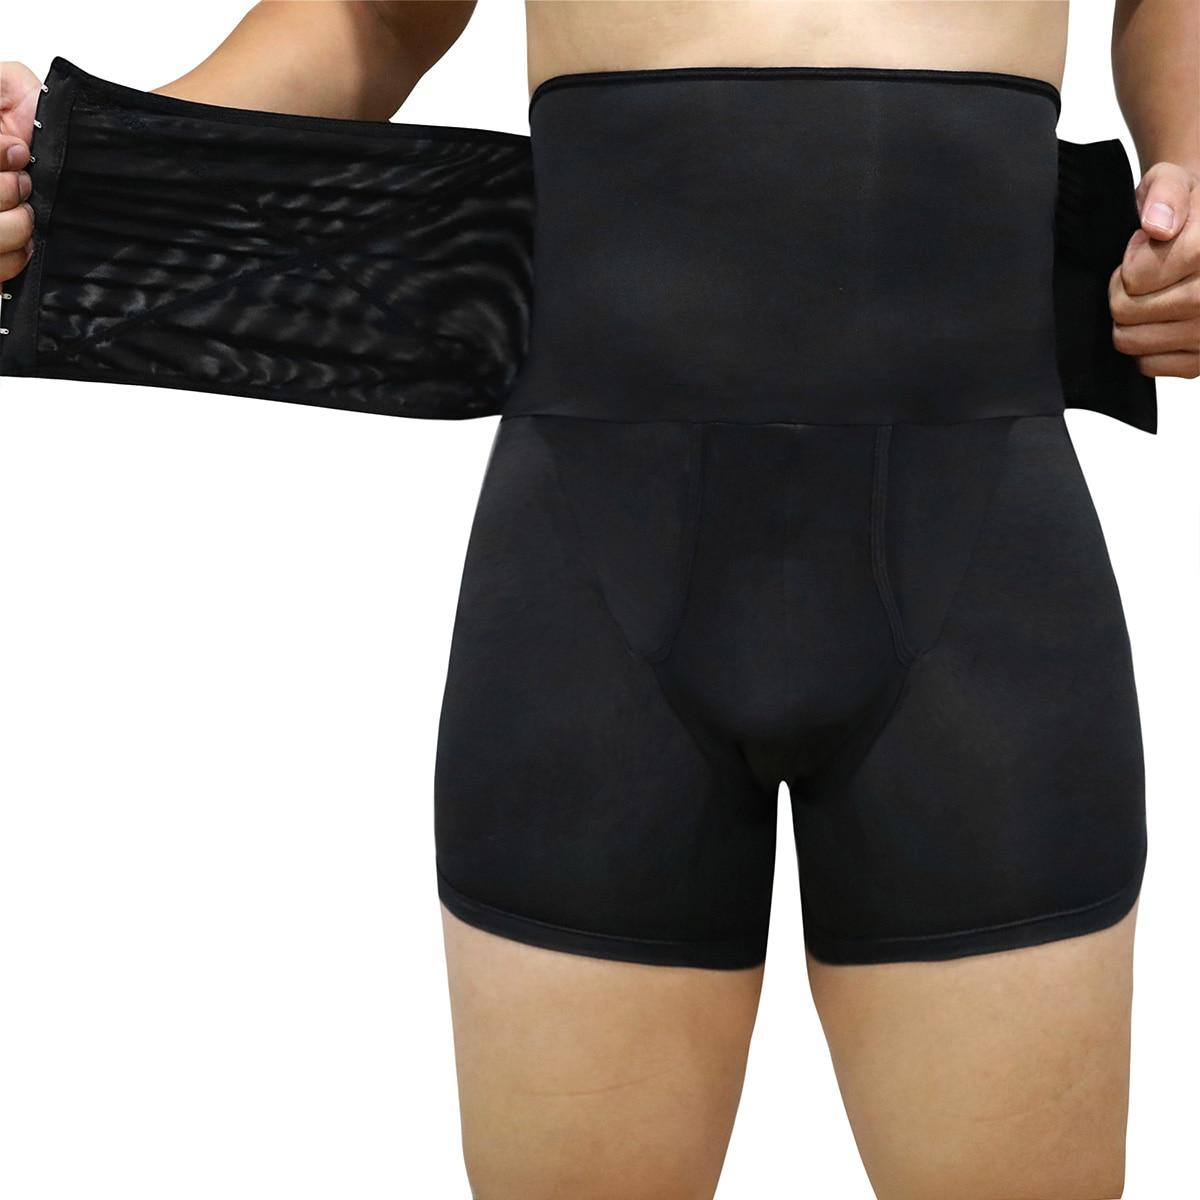 Butt Lifter Men Compression Shorts Body Shaper Slim Waist Control Panties Belly Trimmer Underwear